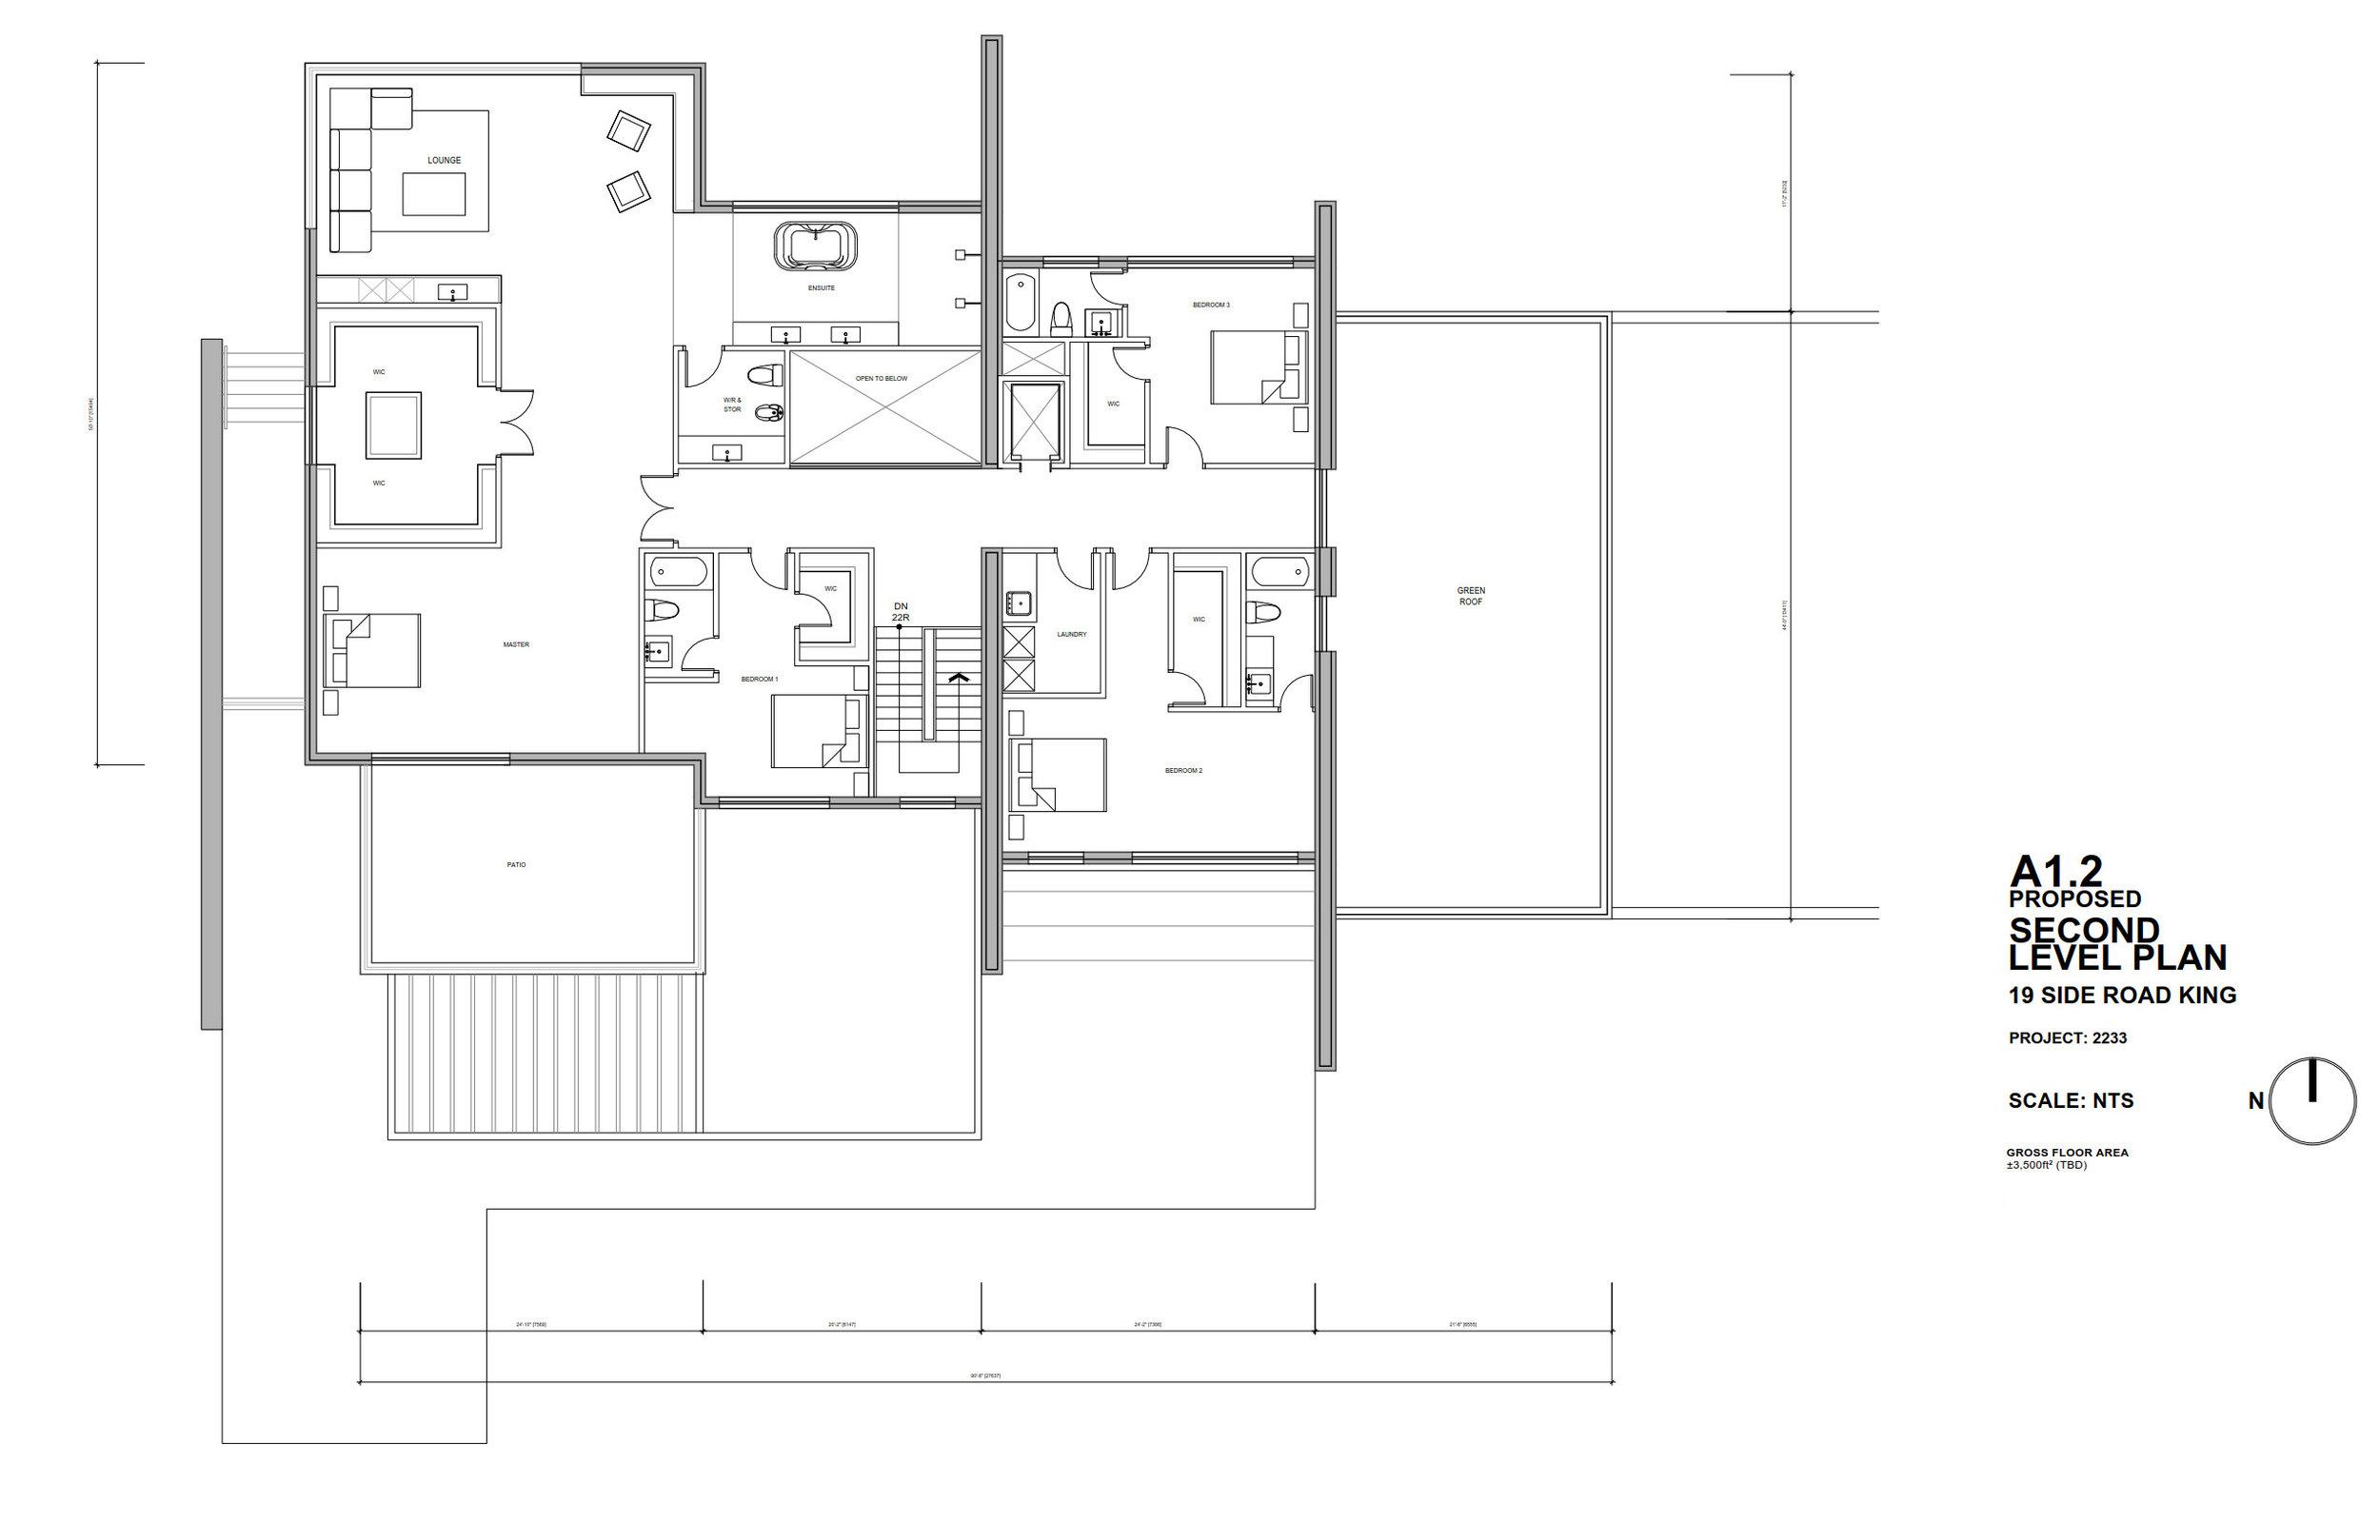 Drawing, Plan, Second Floor